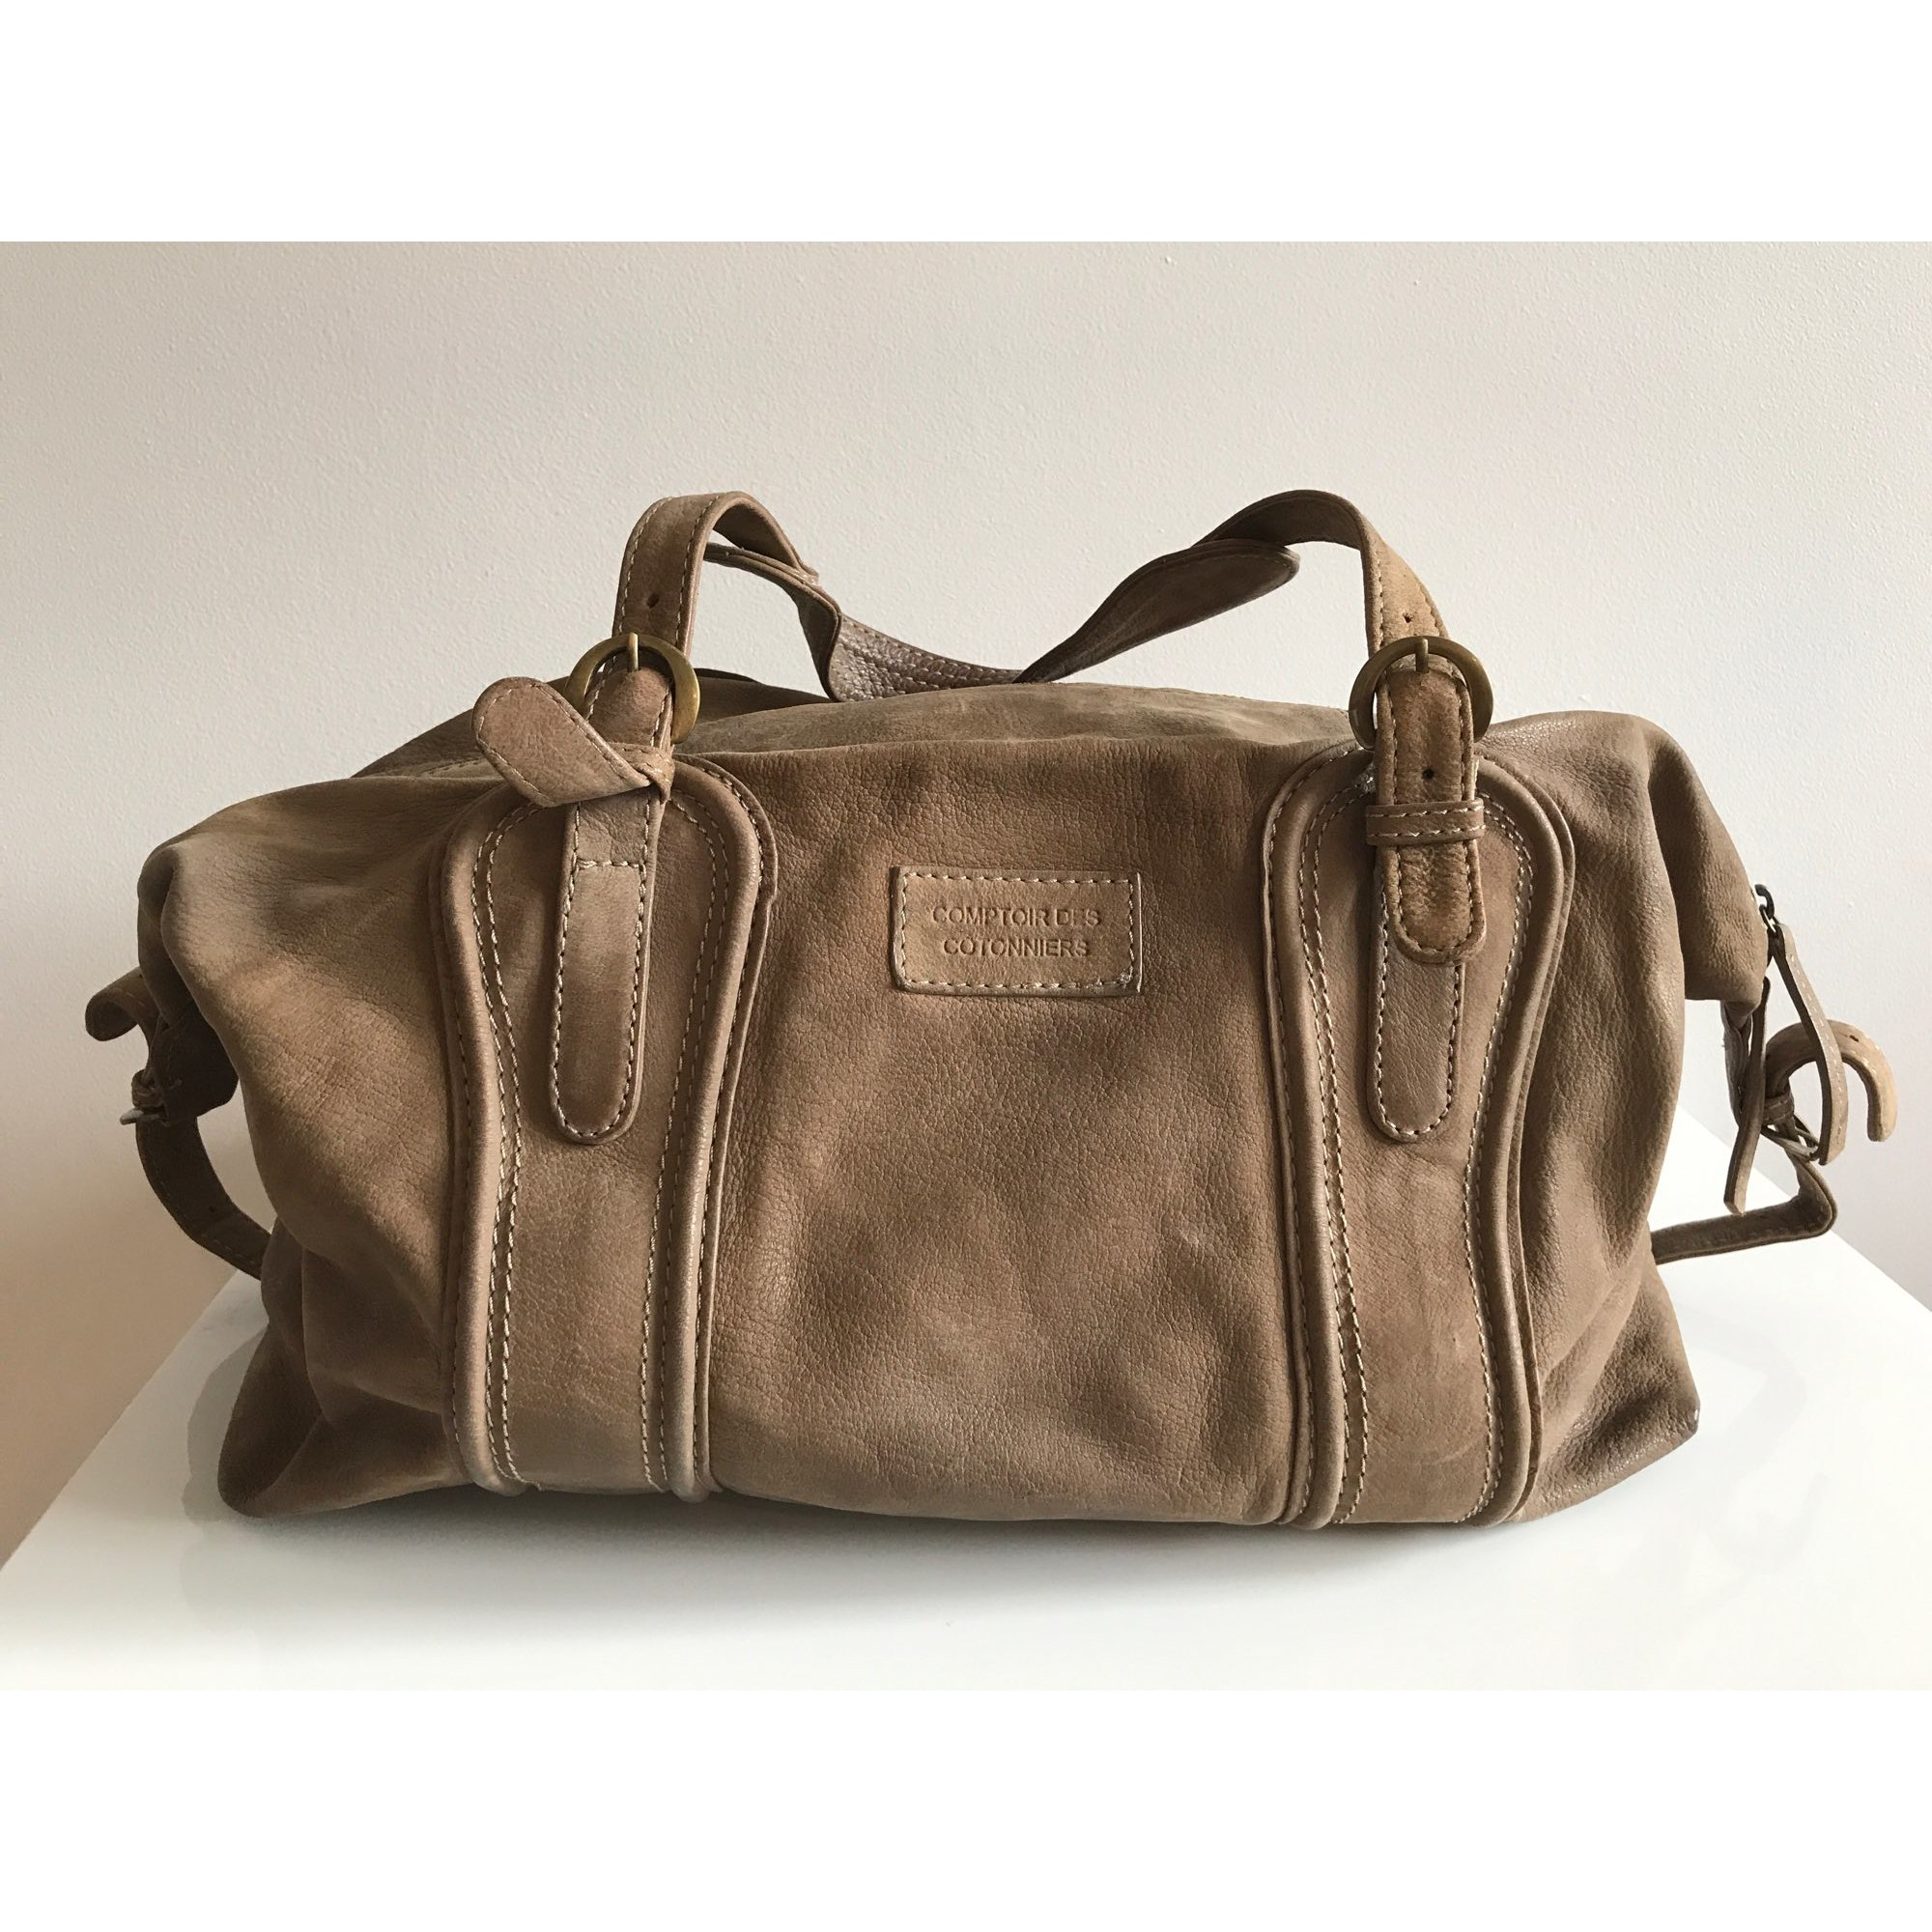 Sac xl en cuir comptoir des cotonniers beige vendu par laline 8 6306352 - Cuir comptoir des cotonniers ...